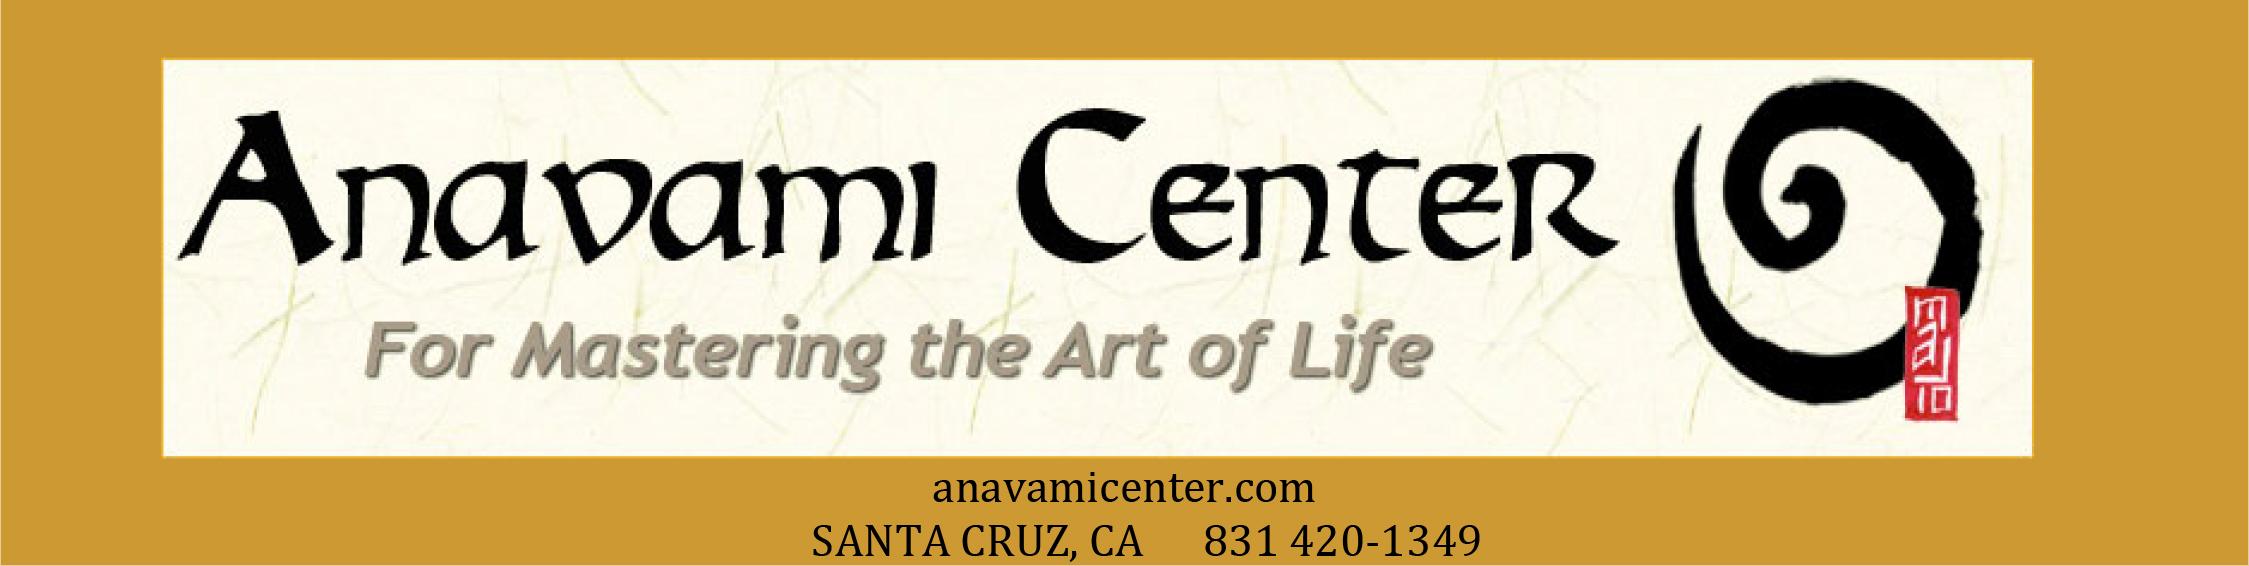 Anavami Center